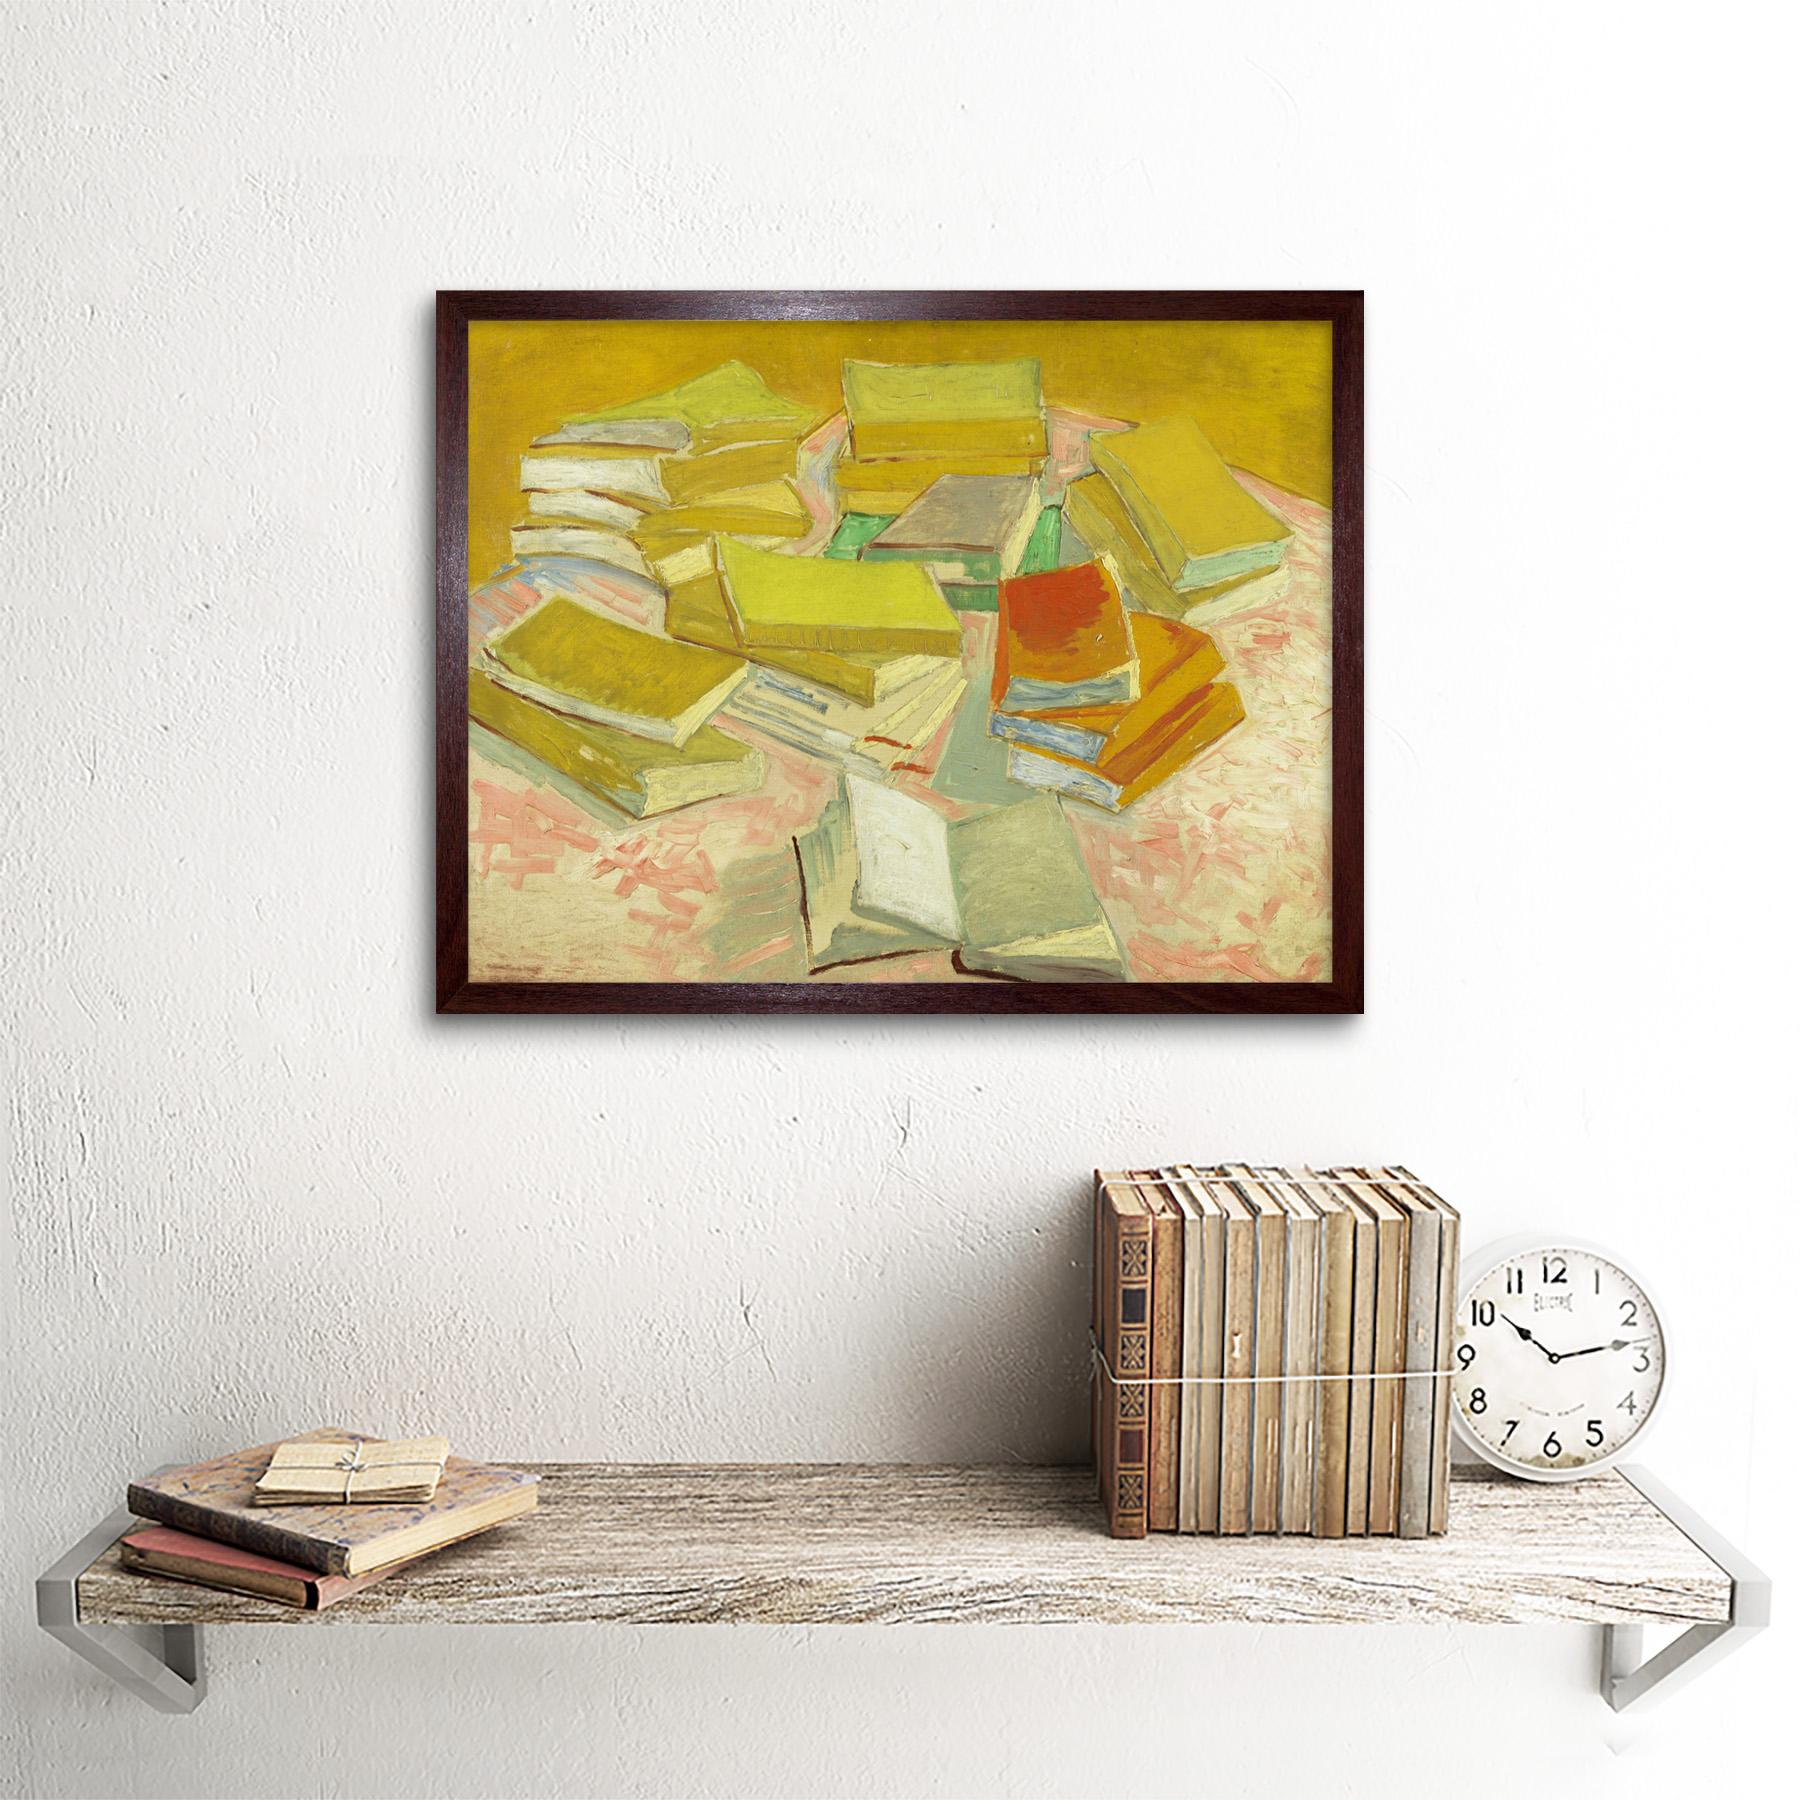 thumbnail 8 - Vincent-Van-Gogh-Piles-Of-French-Novels-Art-Print-Framed-12x16